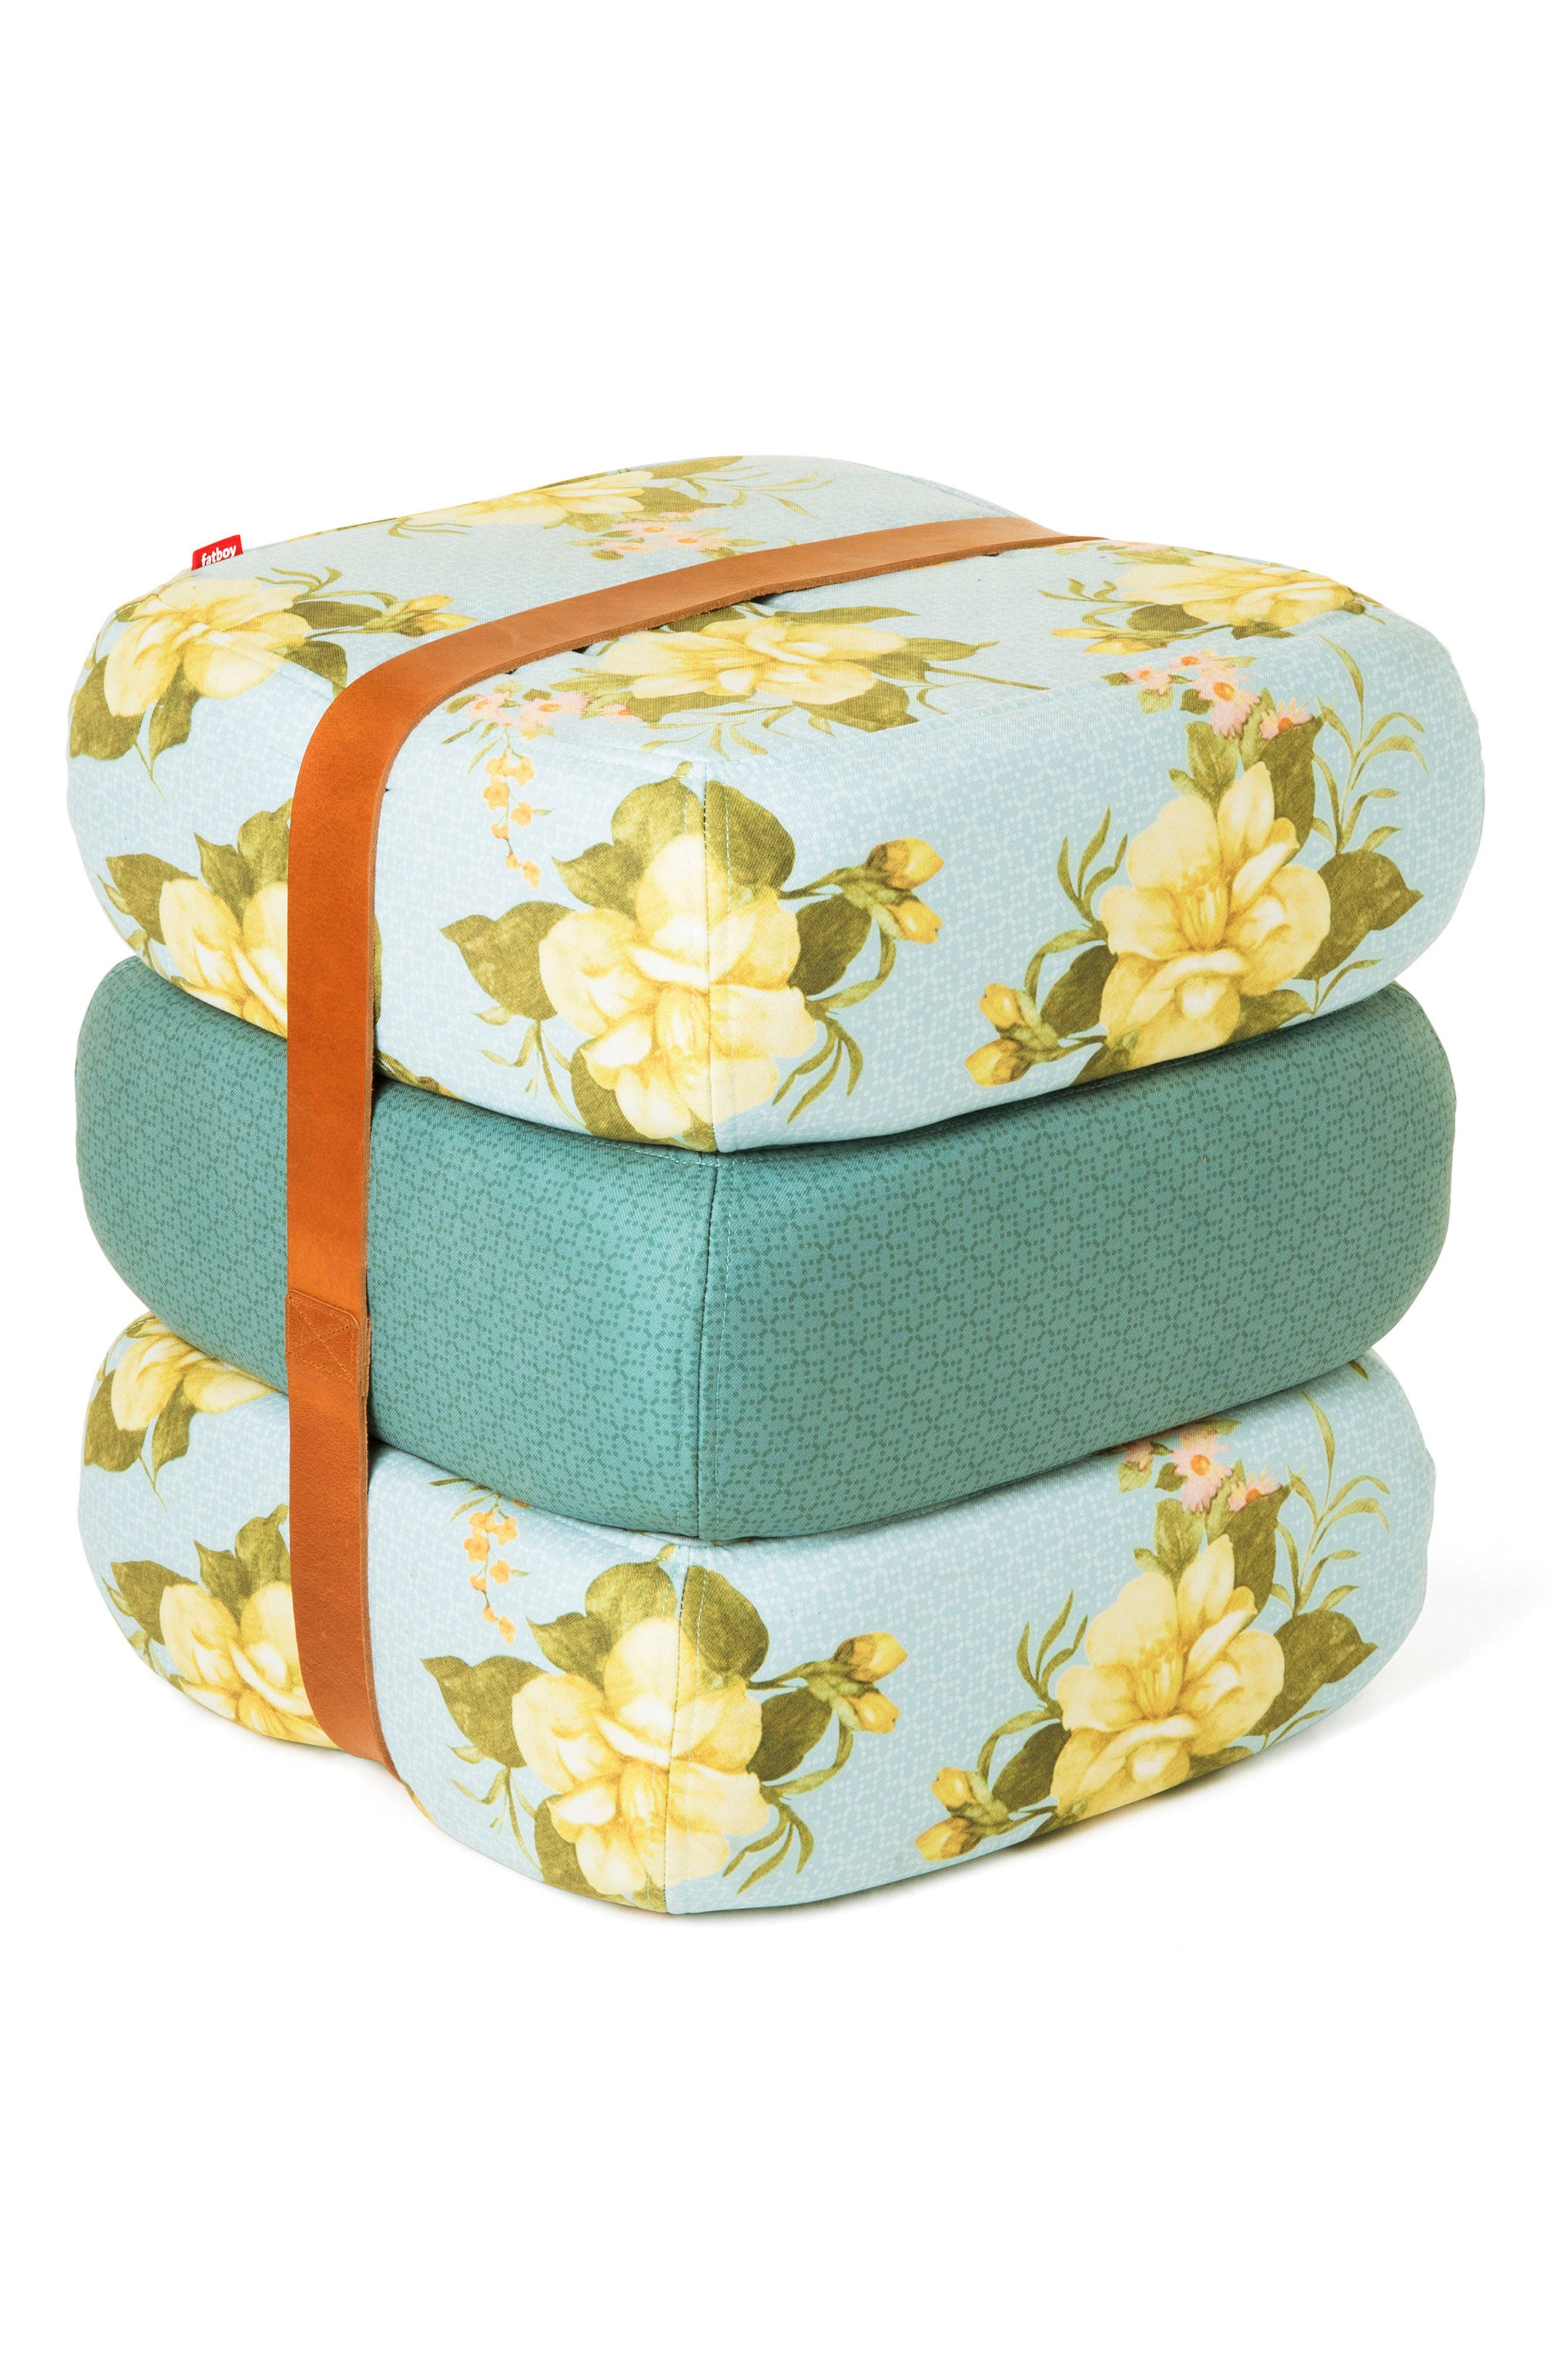 Main Image - Fatboy Baboesjka Set of 3 Pillows